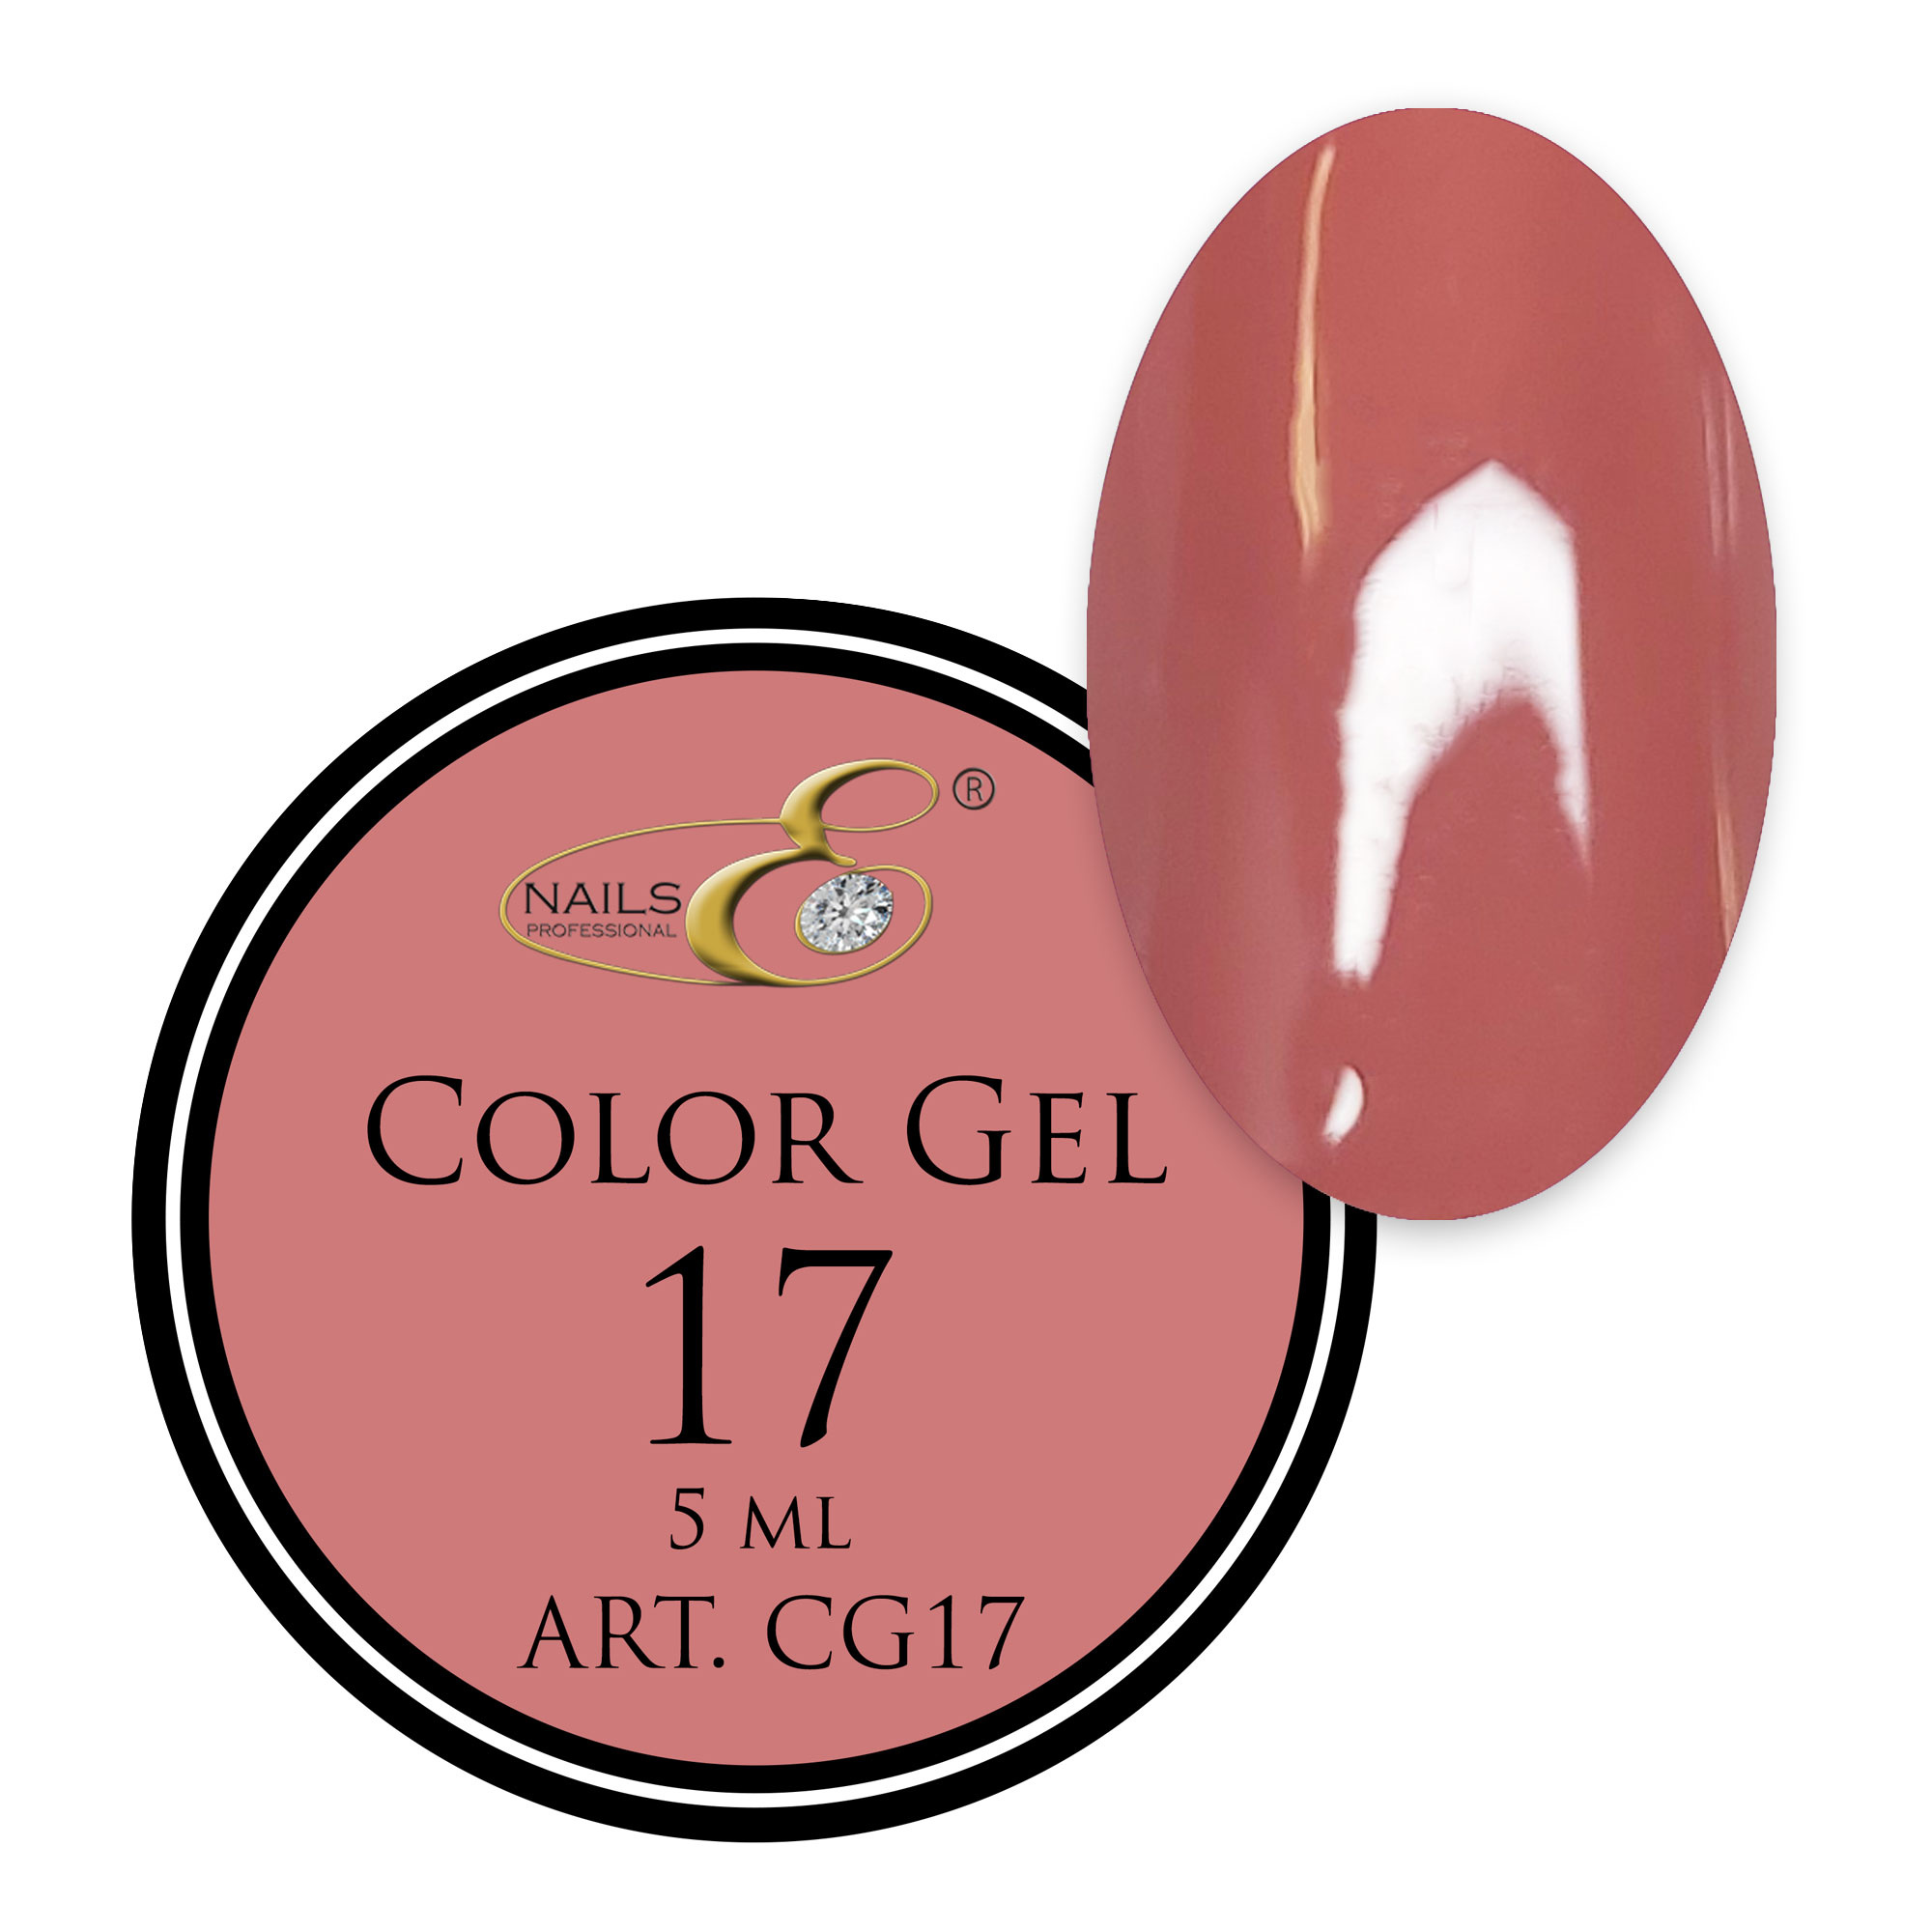 NailsE Professional NailsE Color Gel 17 . 5ml .